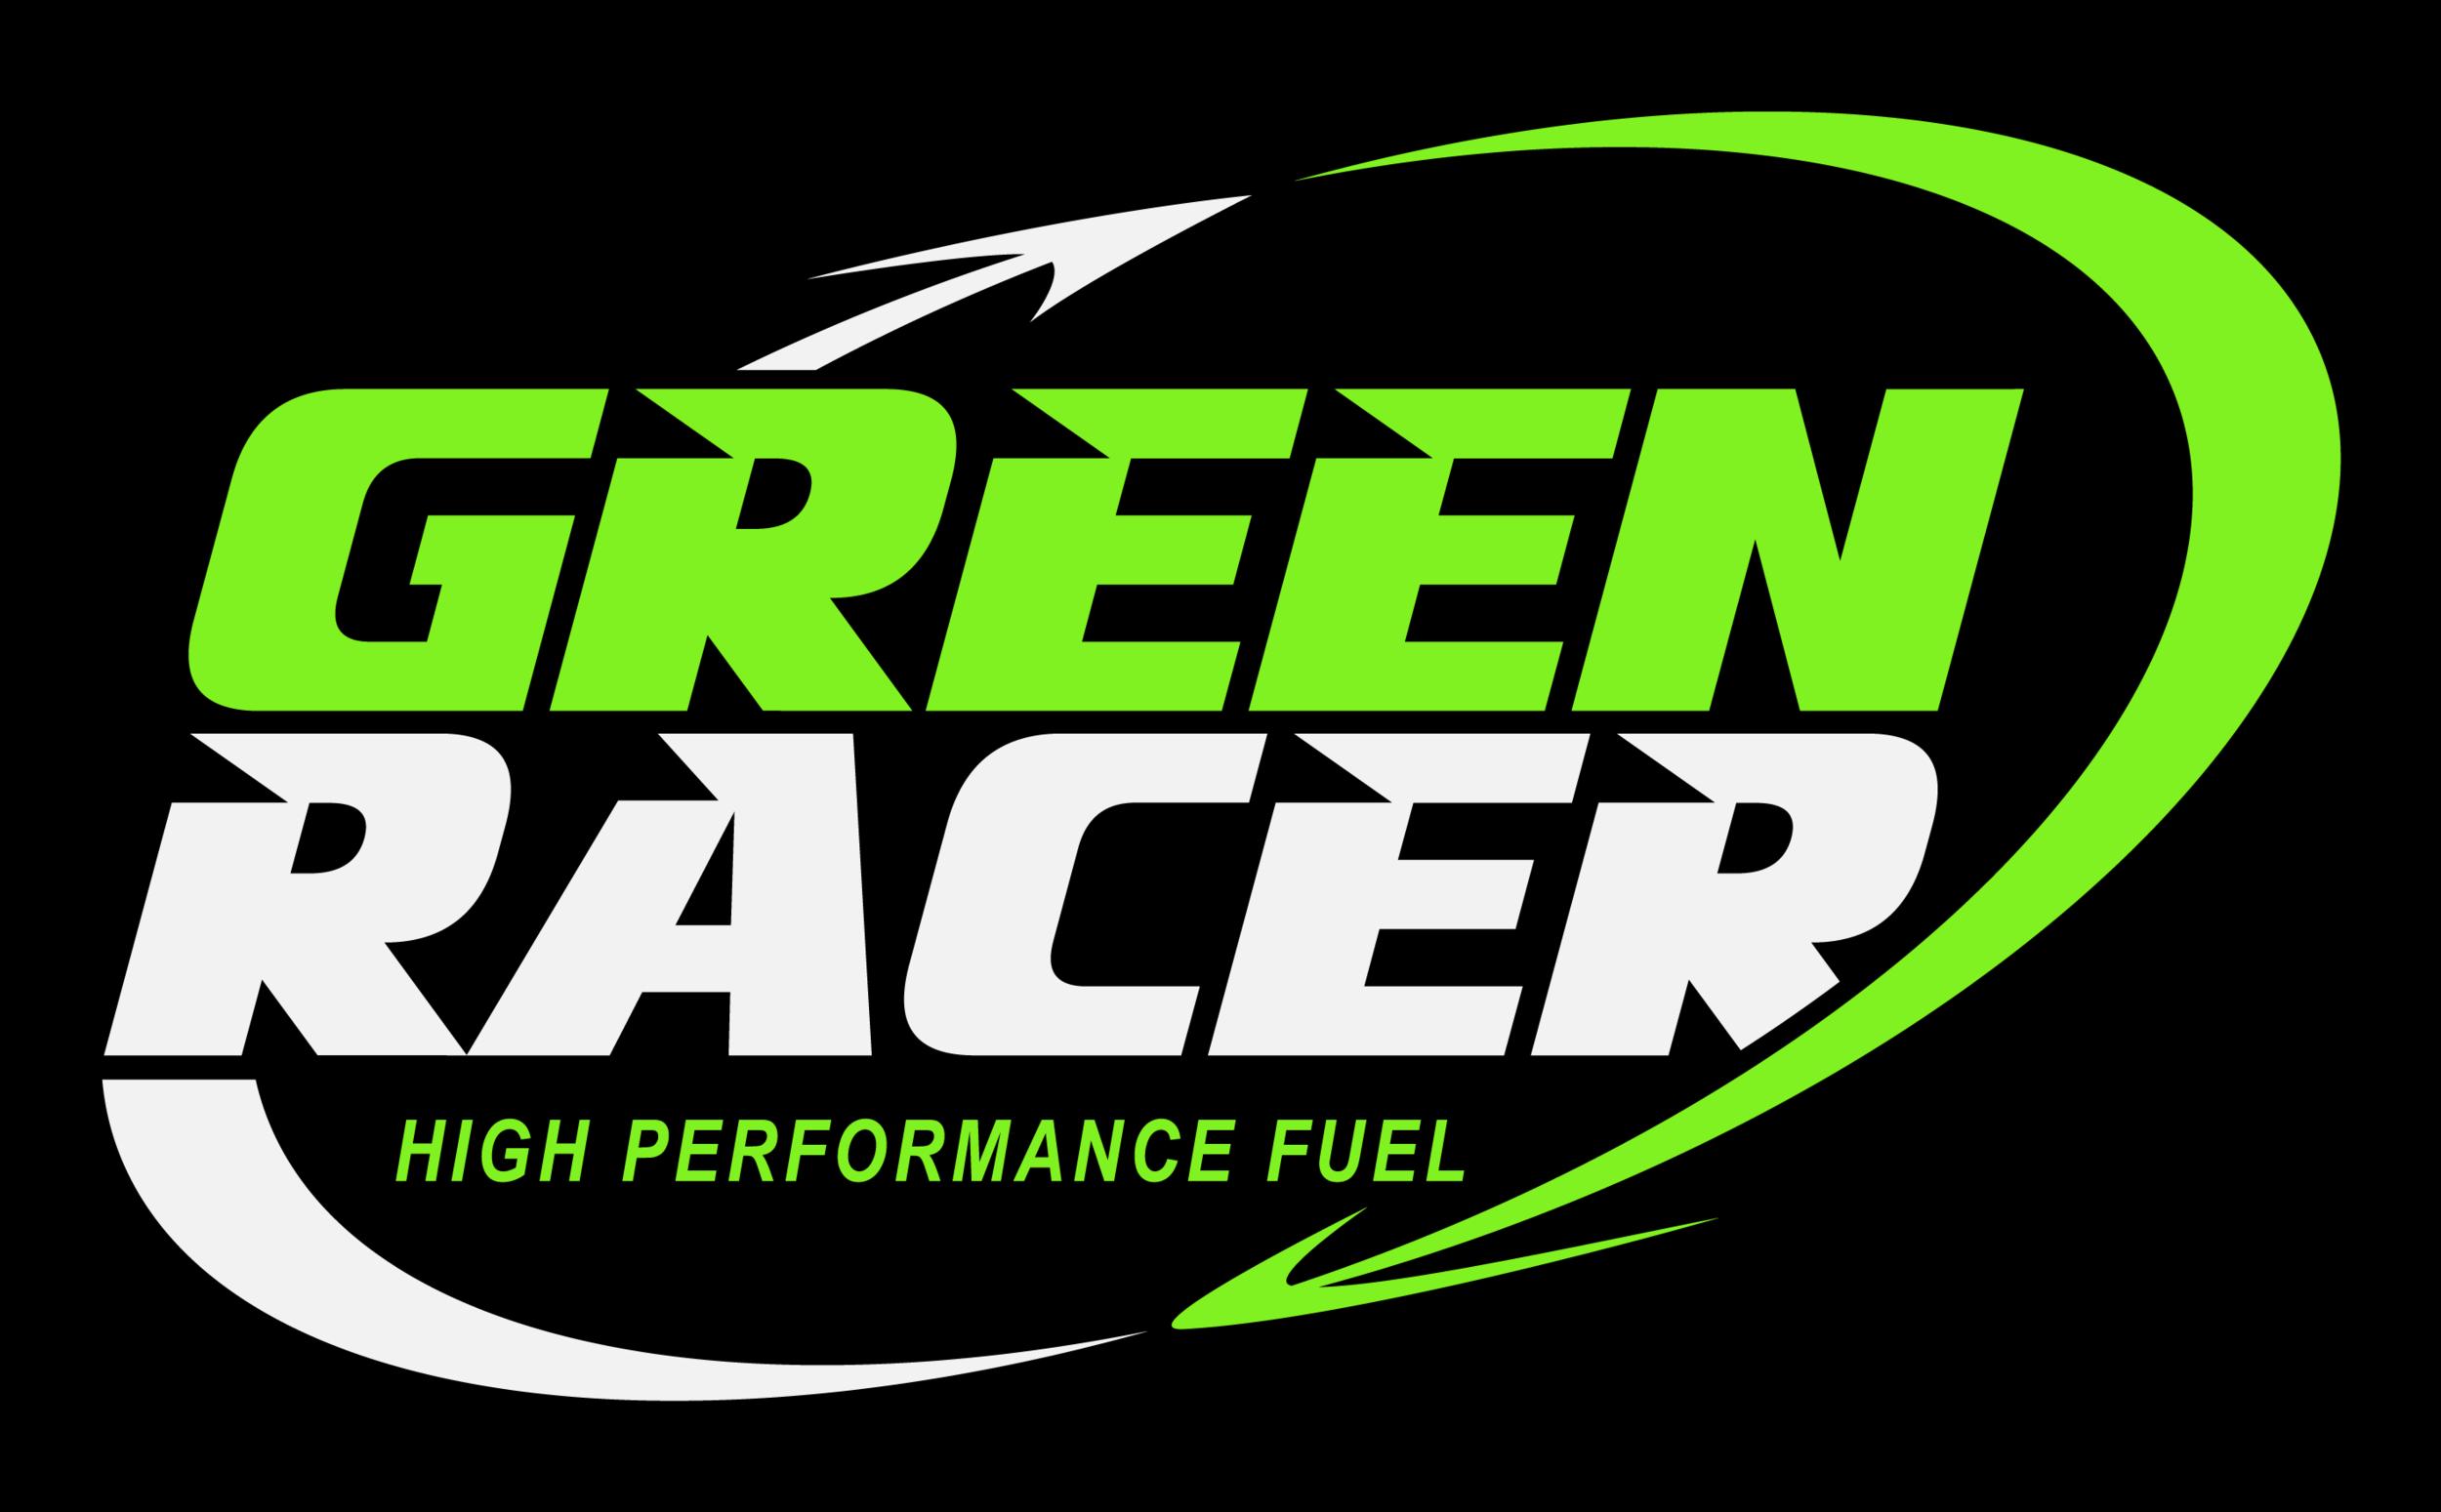 GreenRacerfuel.png